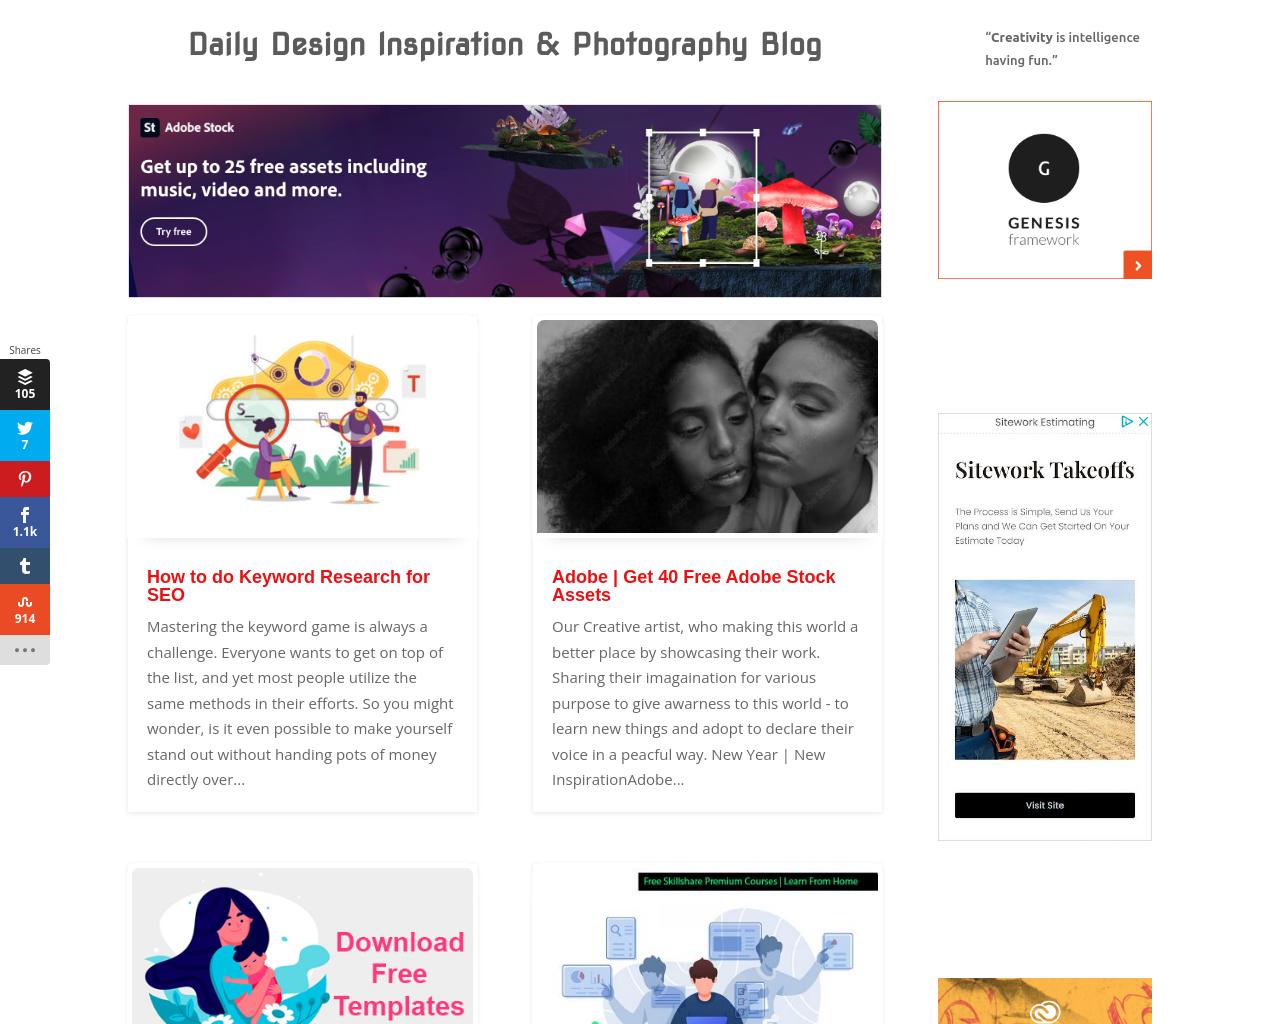 AnimHuT - Creative Blog (Daily Design & Random Photography Inspiration Blog)